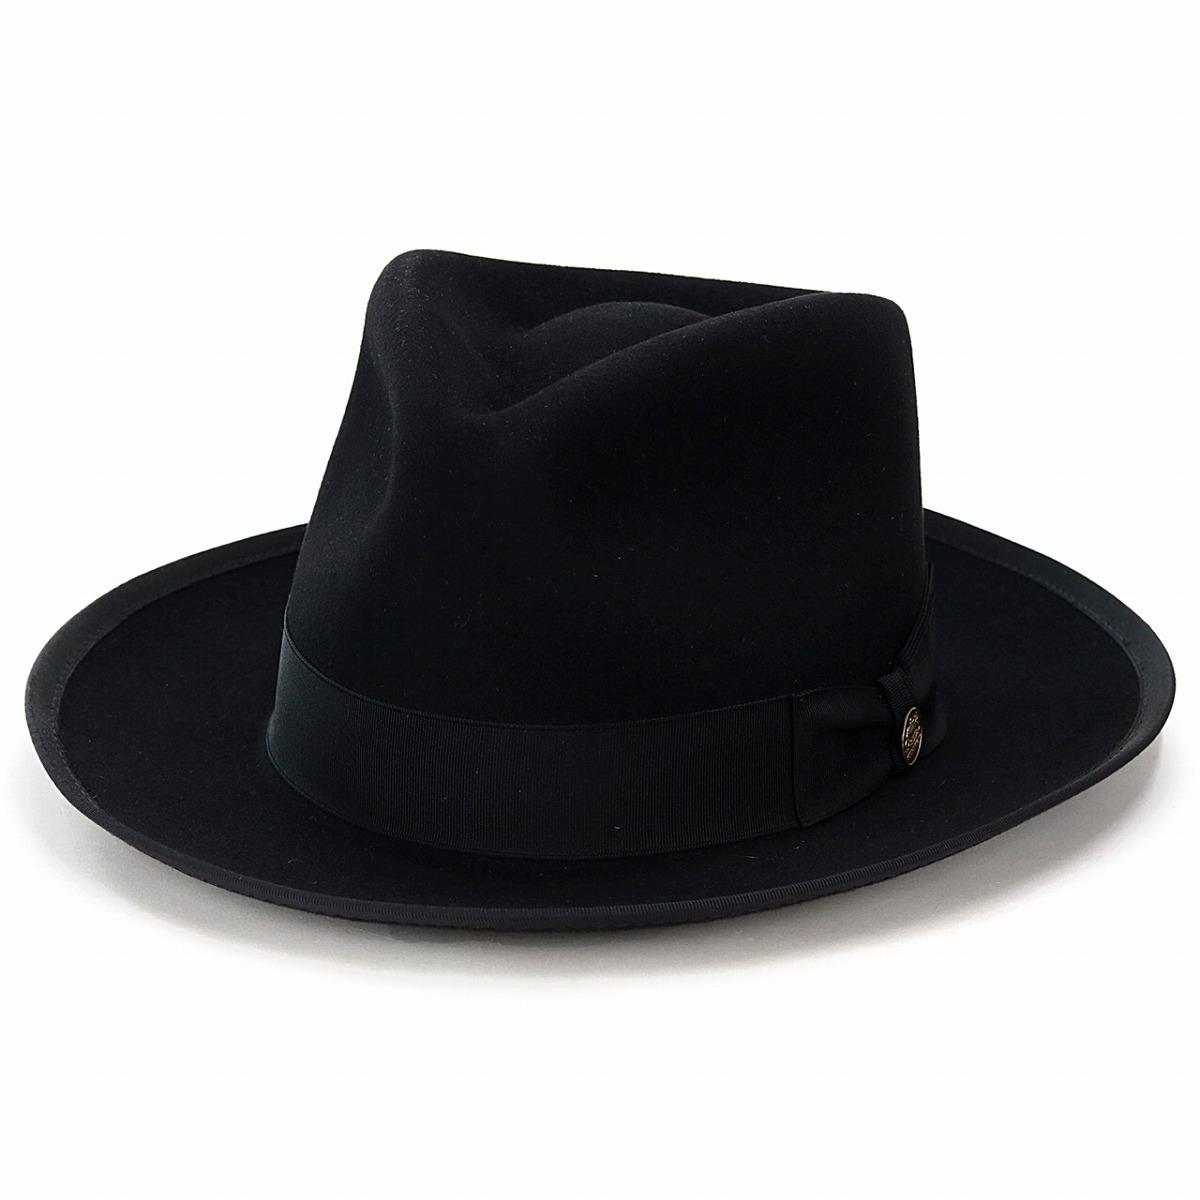 Felt hat men Stetson soft felt hat hat vintage we pet STETSON WHIPPET  high-quality American brand gentleman hat classical black black  fedora  stetson  hat ... 24046767394f